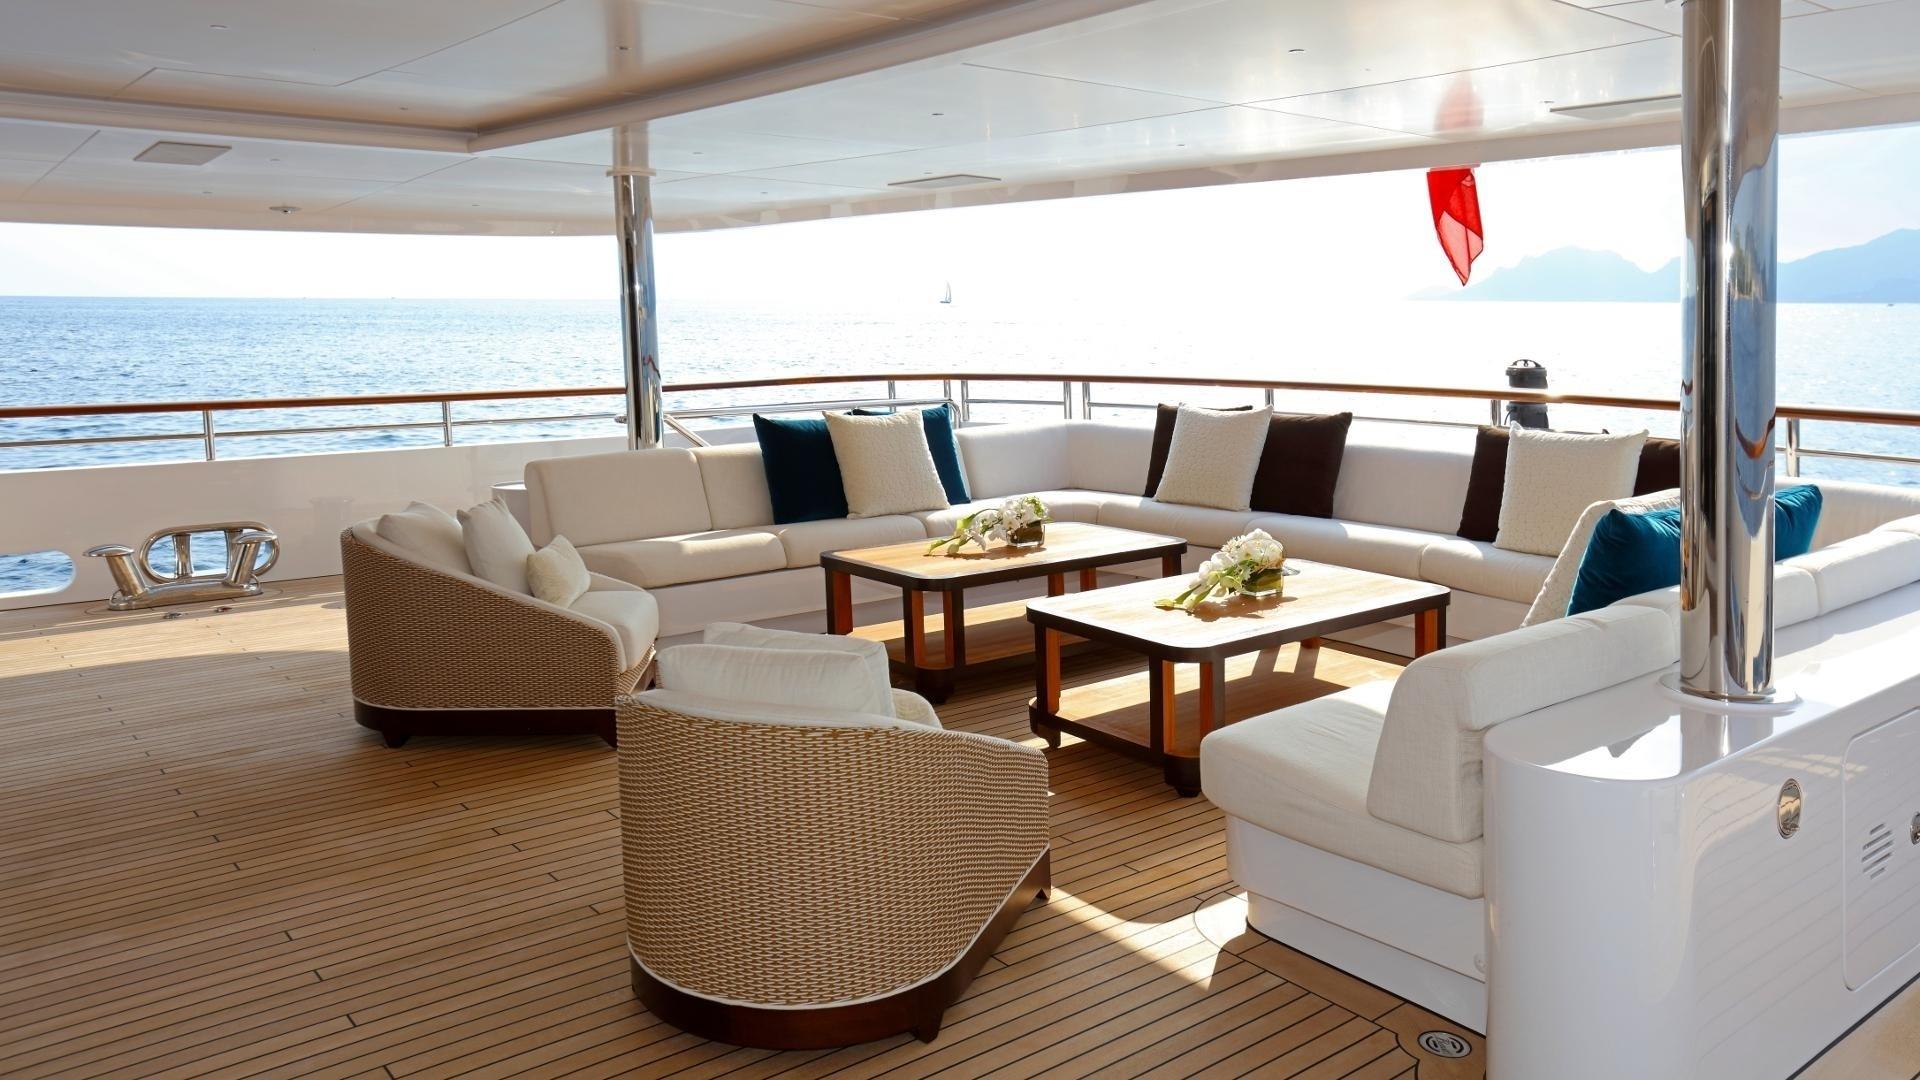 main deck aft u-shaped sofa and coffee tables